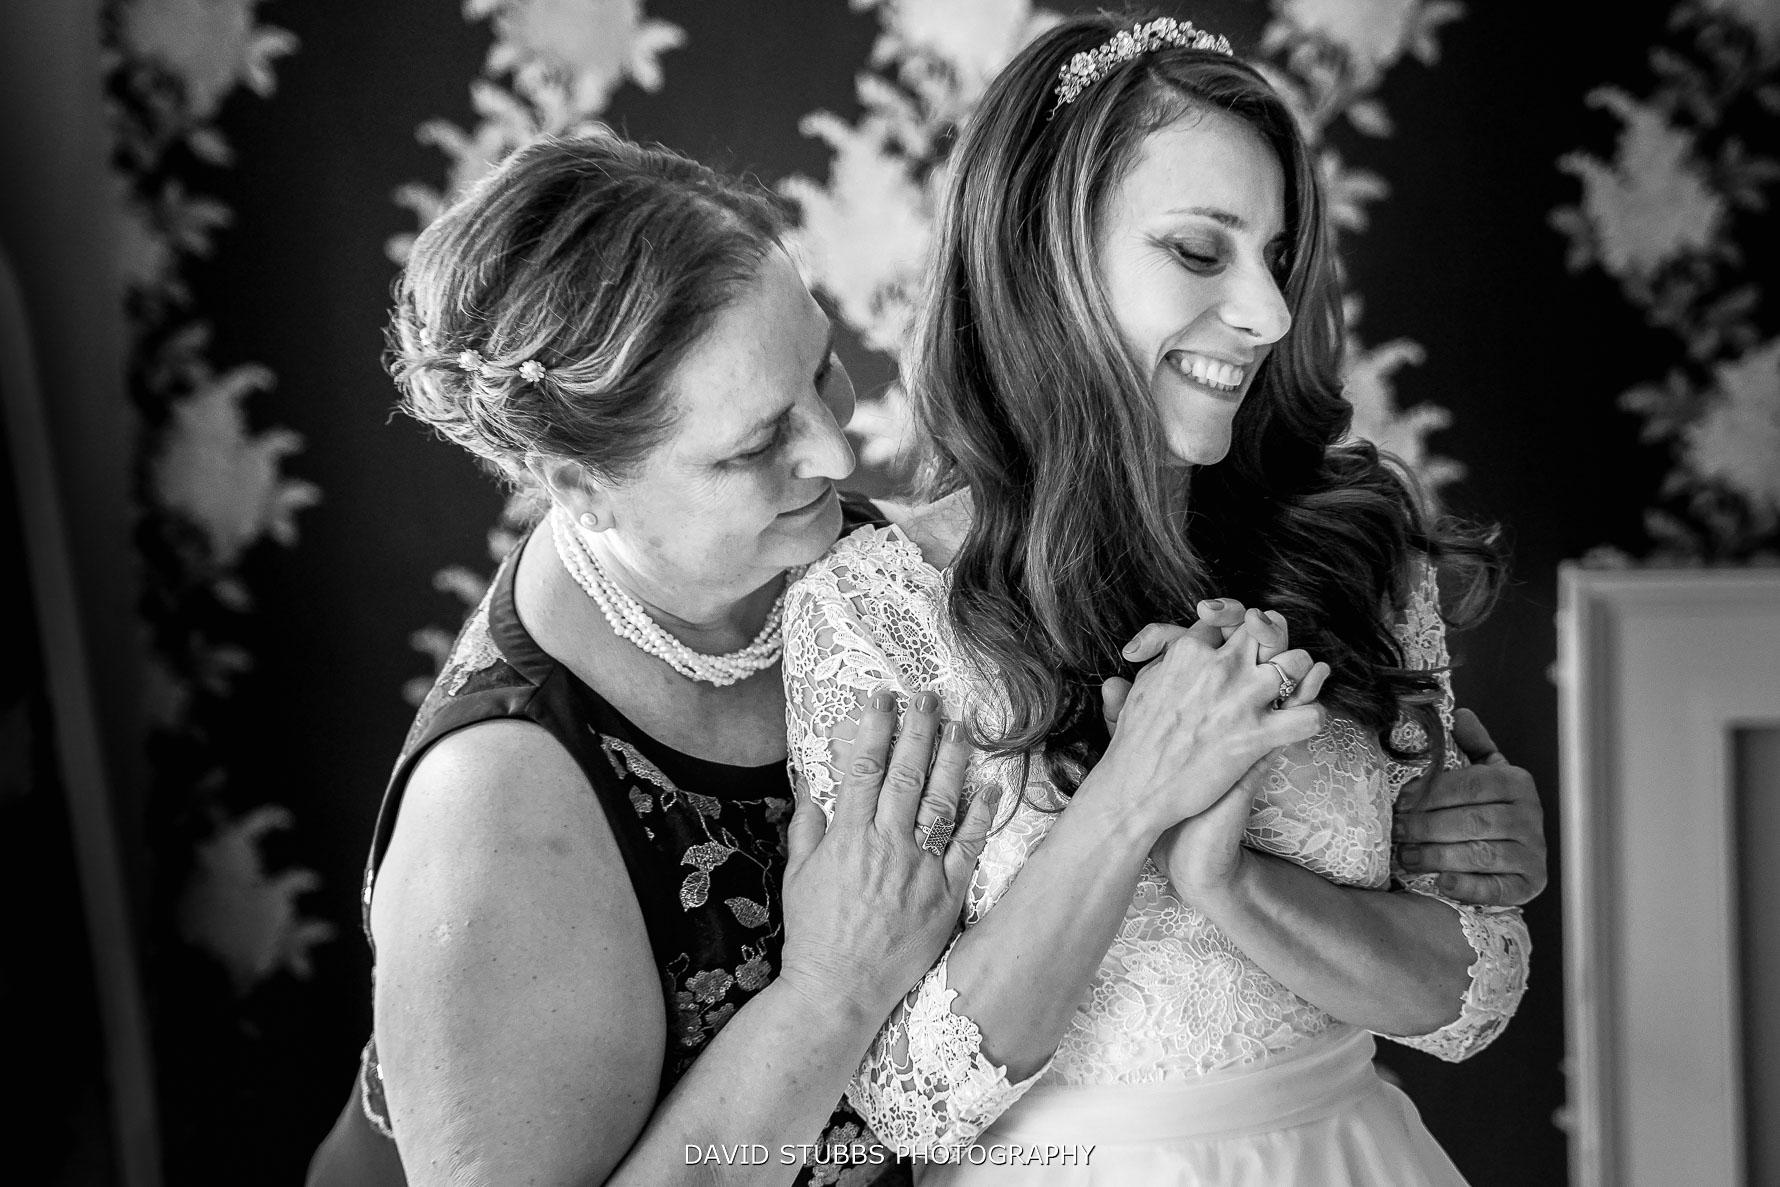 mum and daughter relationship